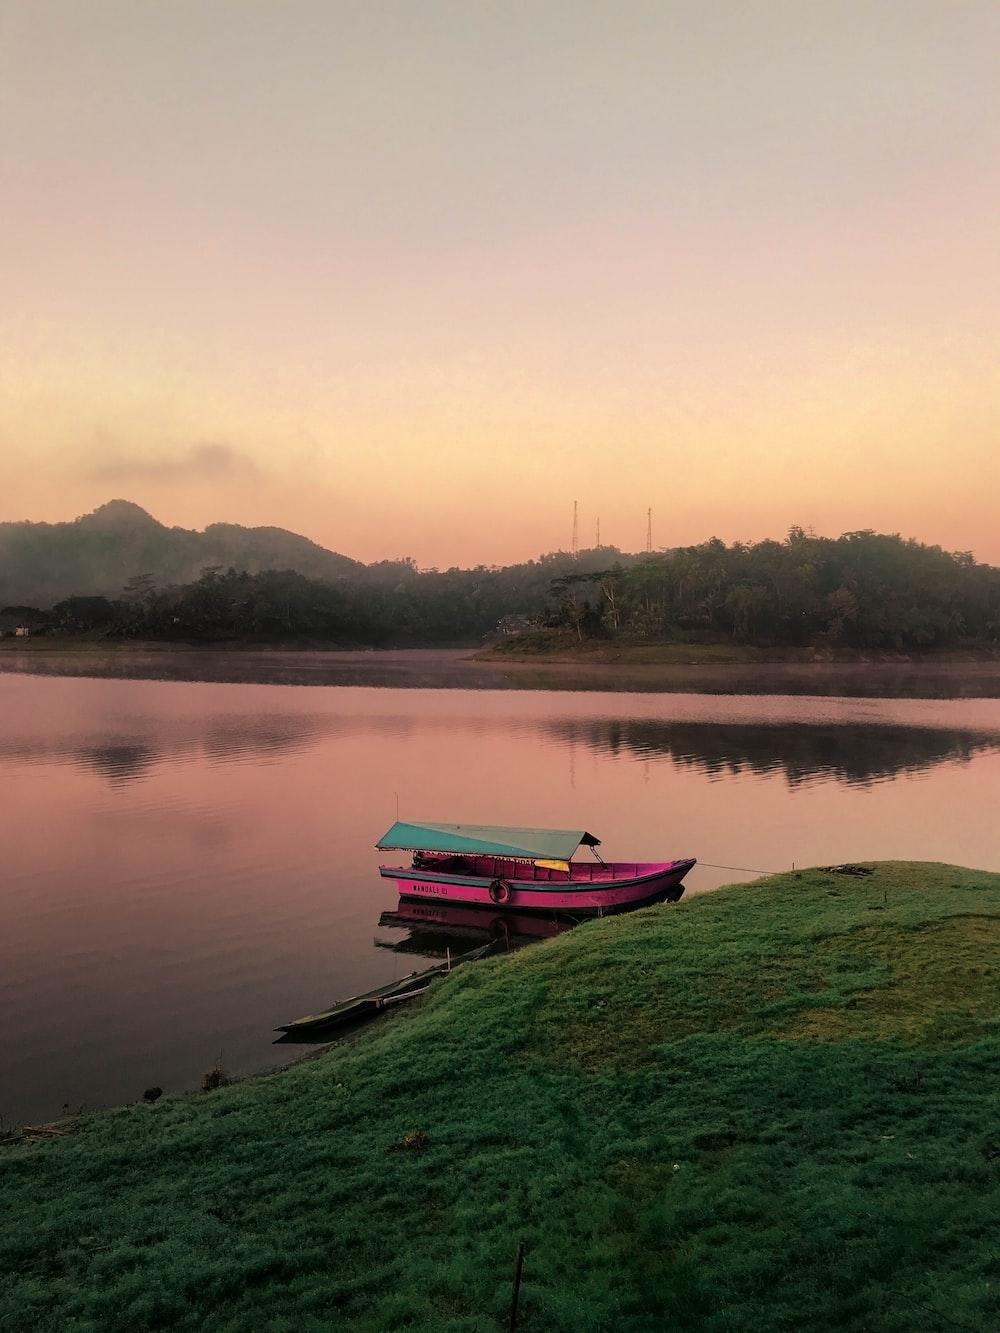 pink boat on body of water beside island